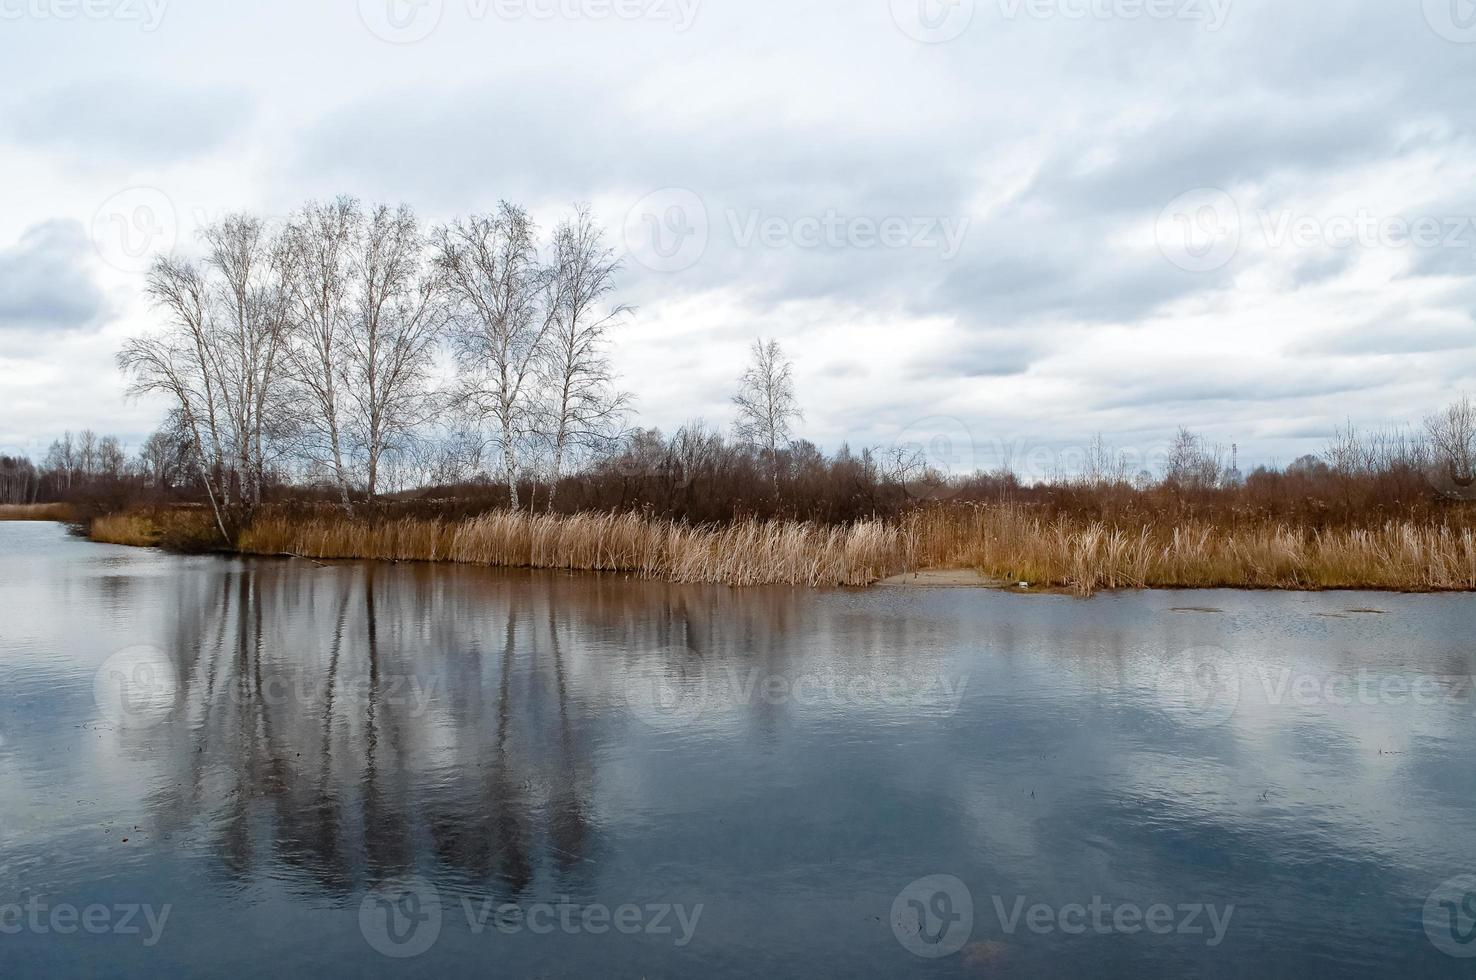 automne sibérien photo